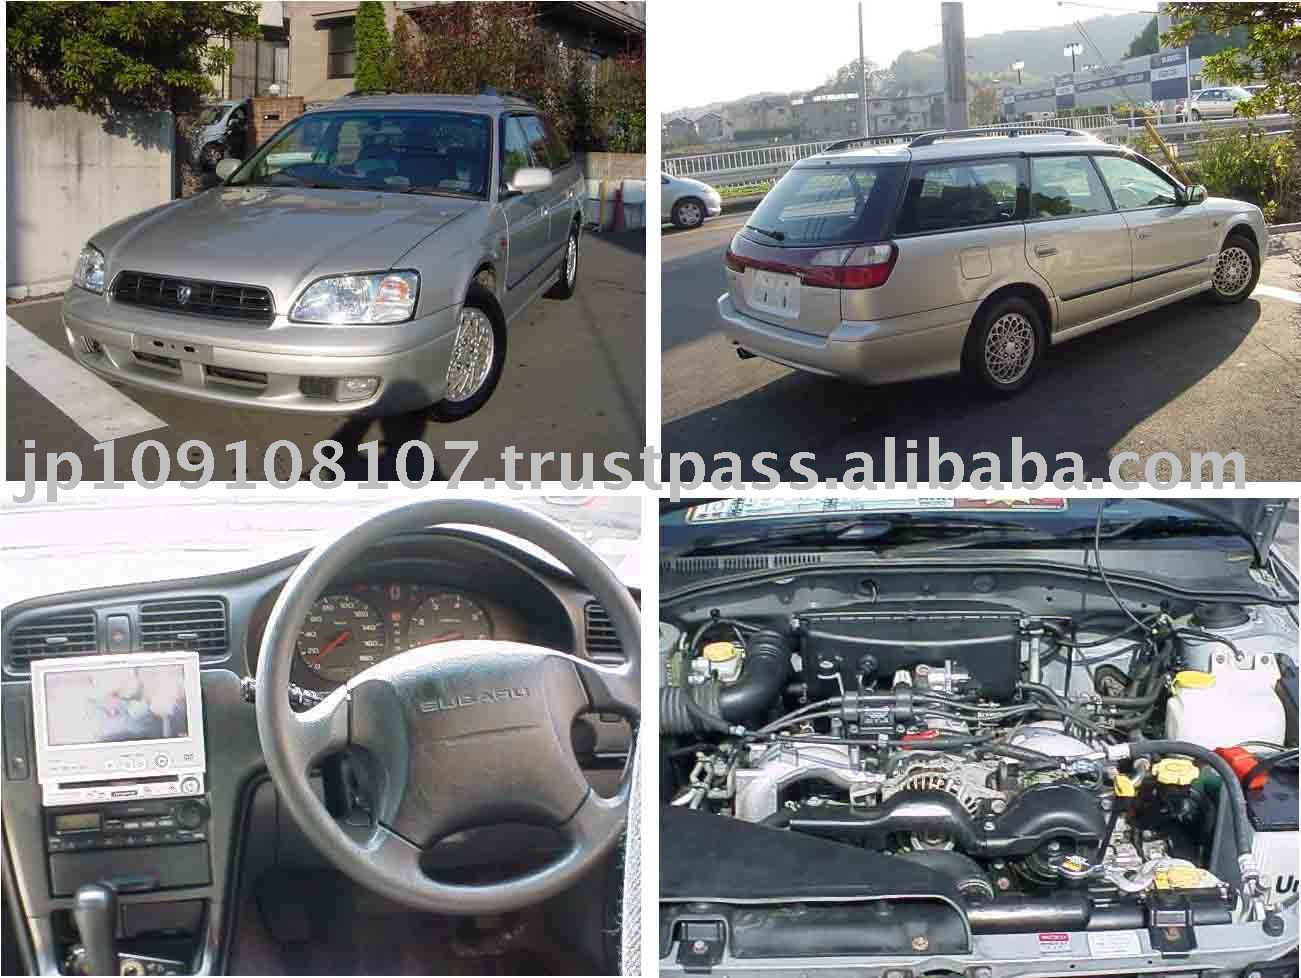 1998 used car subaru legacy wagon brighton wagon rhd 106800km gas petrol silver buy used cars japanese used cars second hand cars product on alibaba com